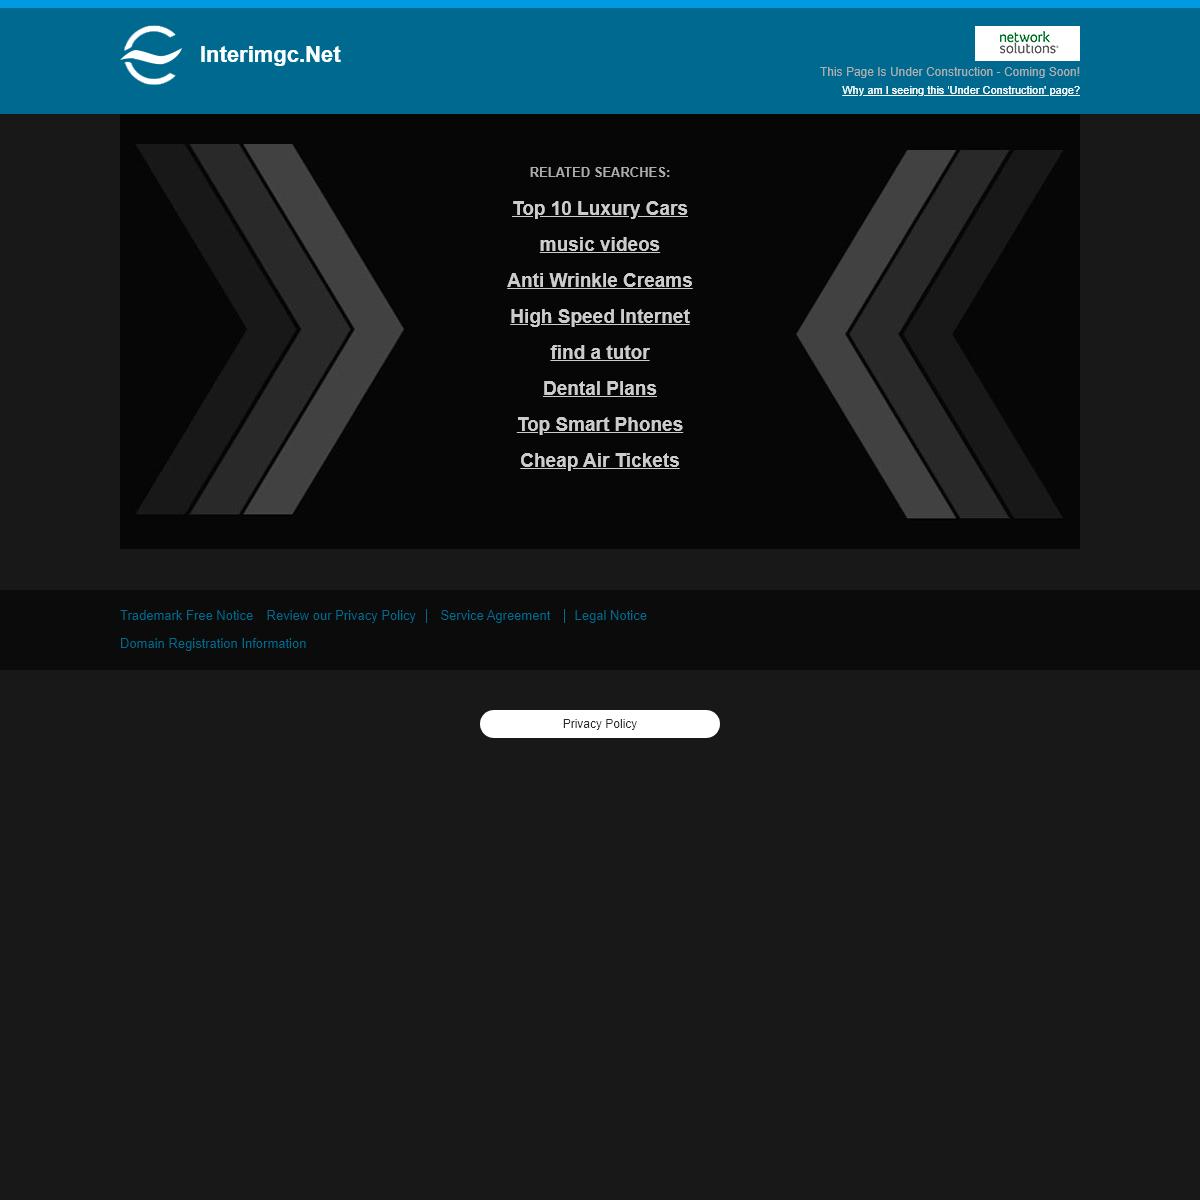 Interimgc.net